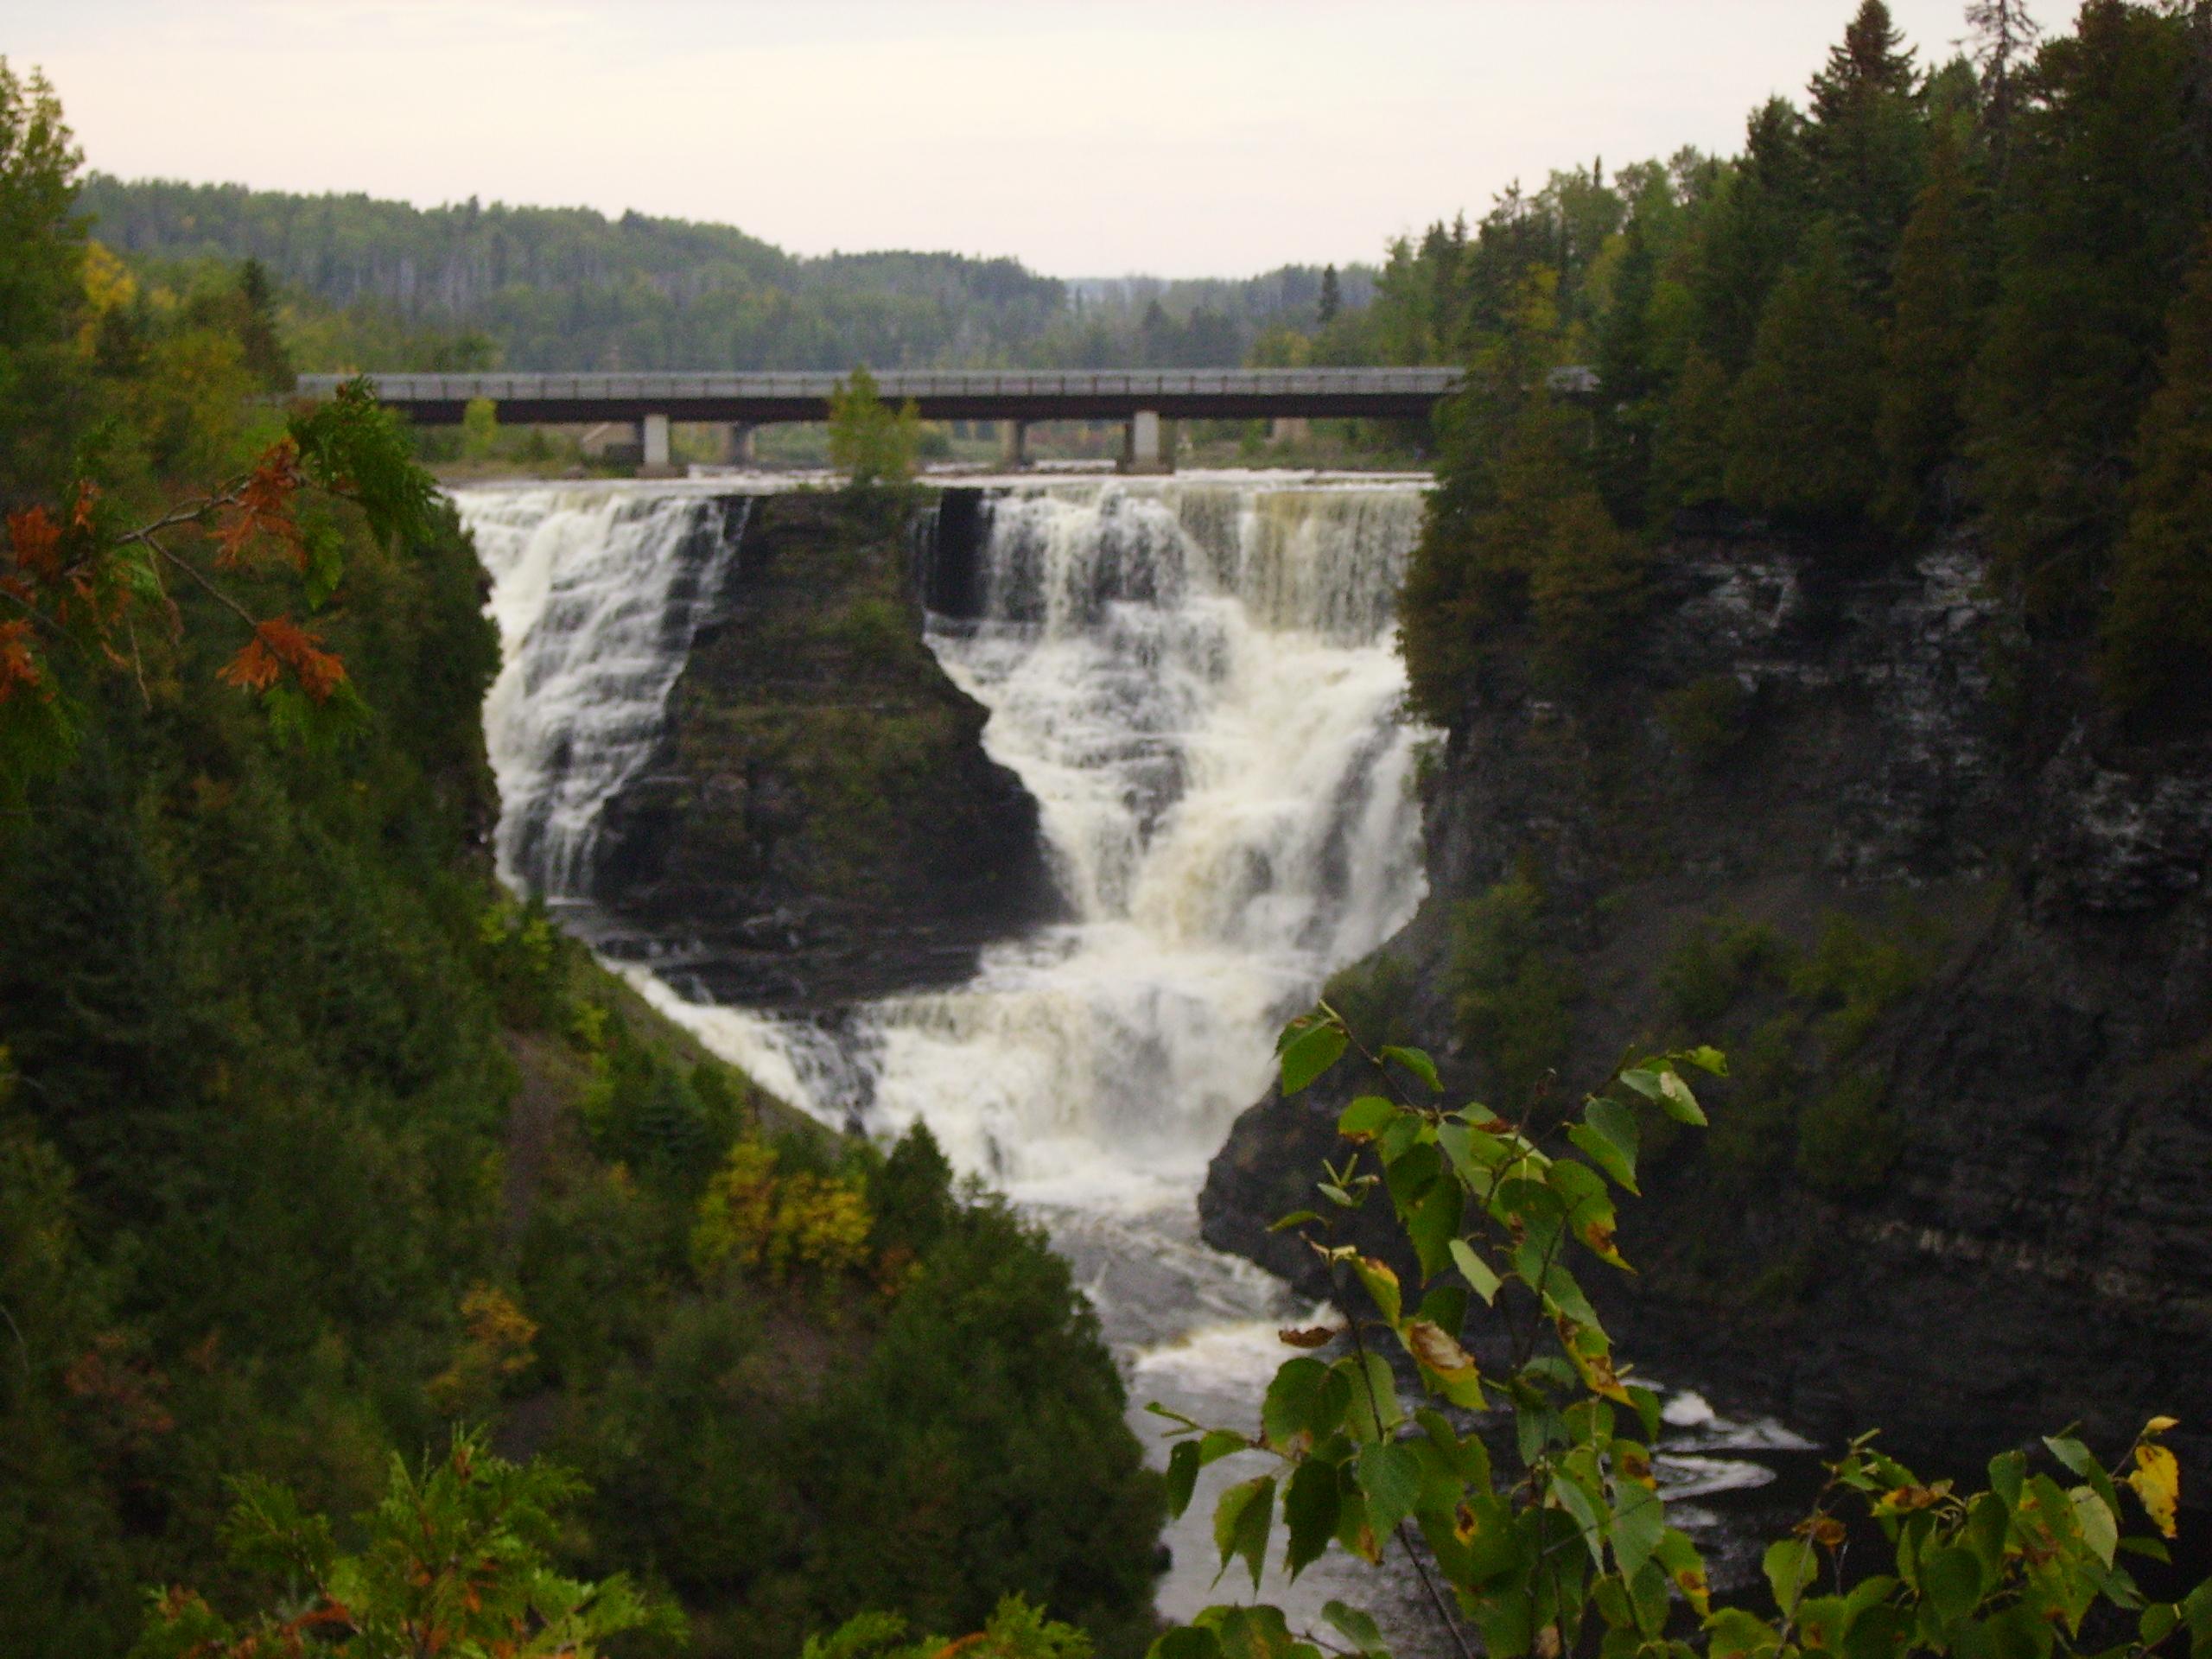 Kakabeka Falls on the Kaministiquia River, Ontario, Canada